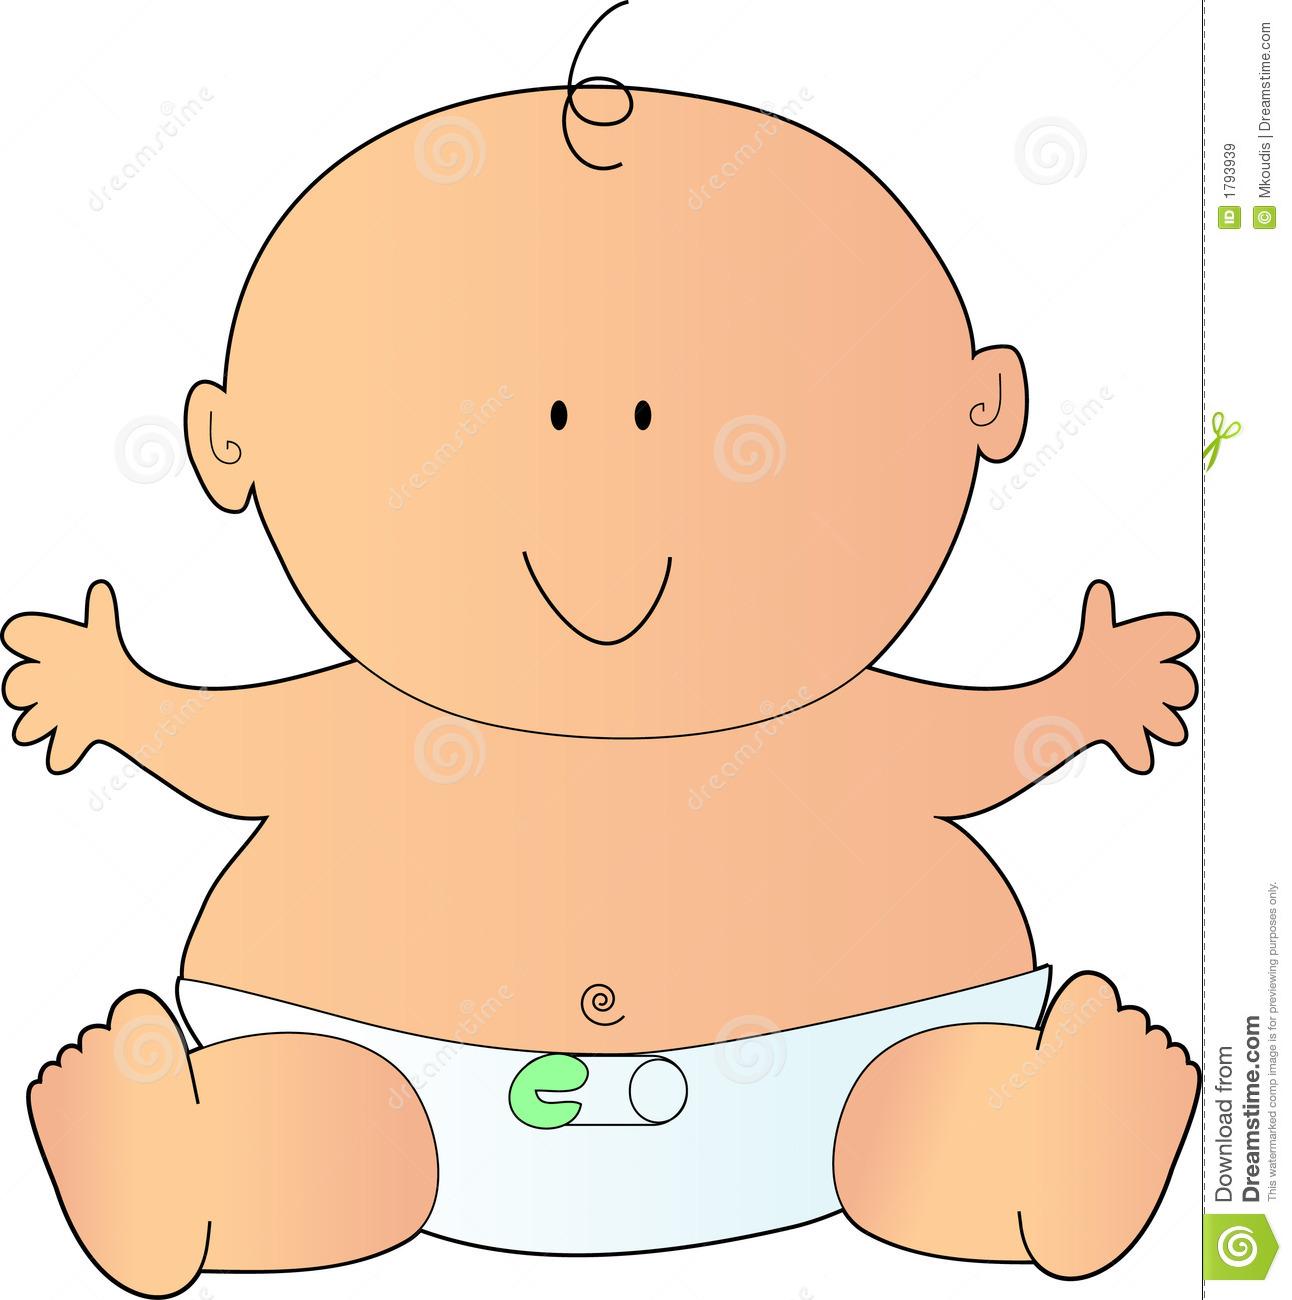 Cute Newborn Baby Clipart-Cute Newborn Baby Clipart-3